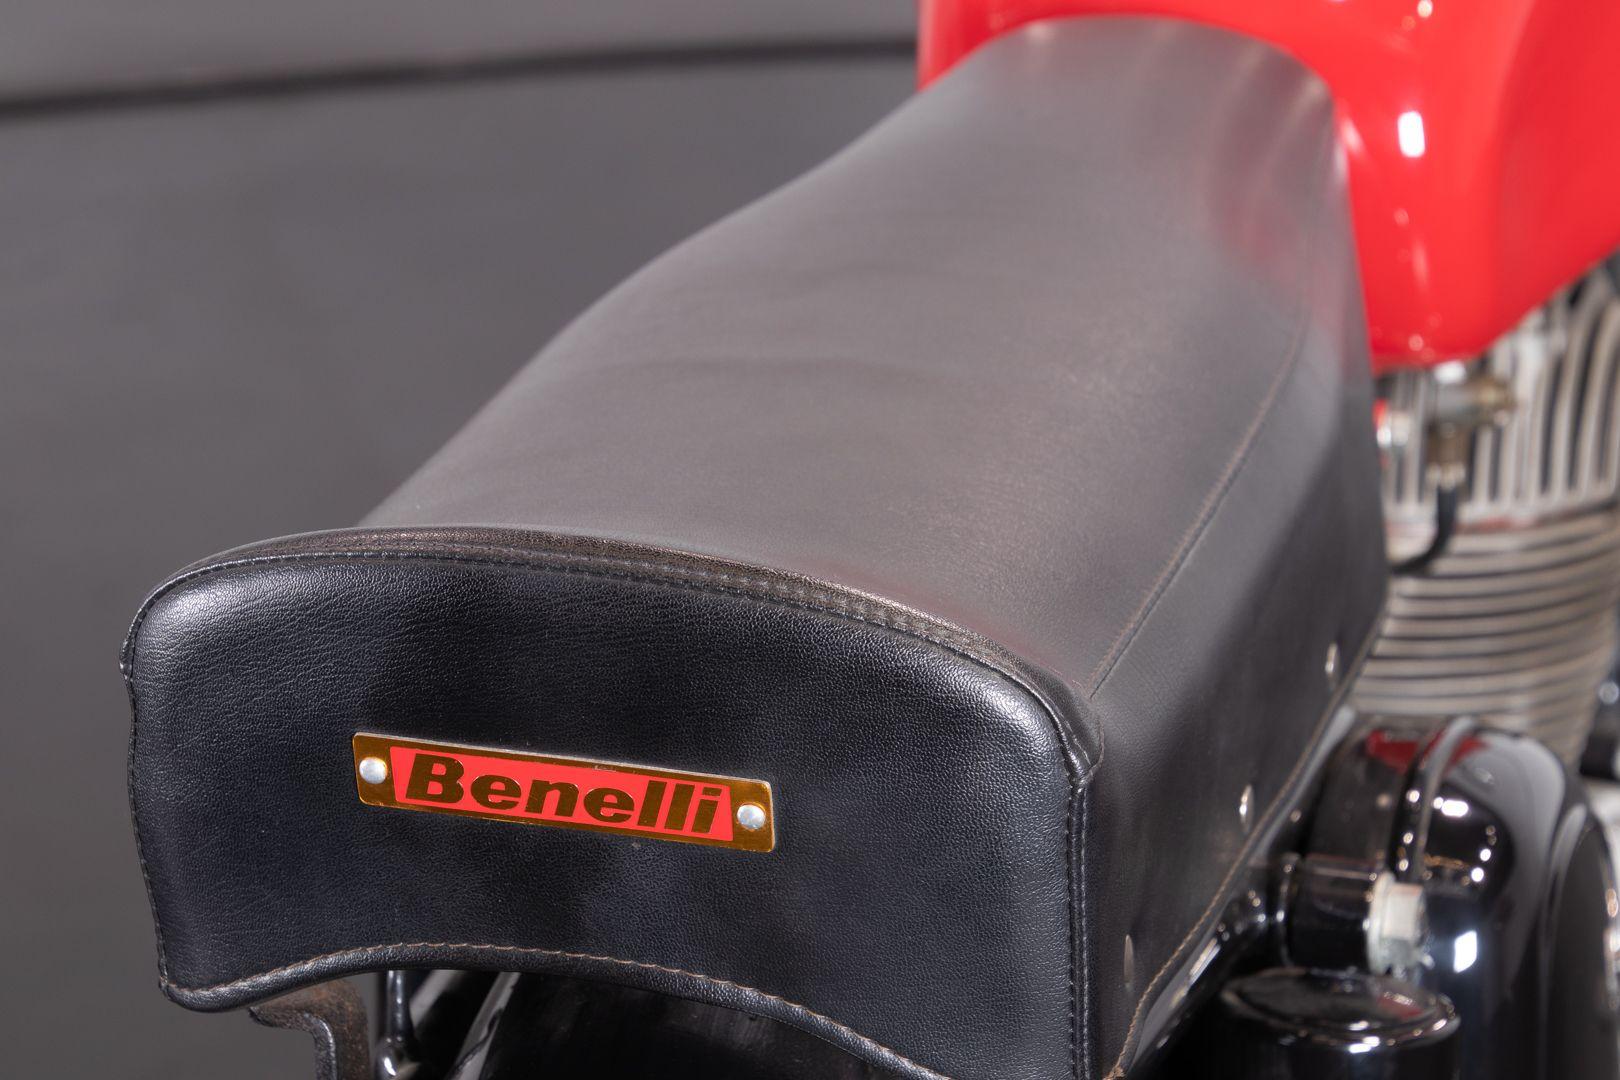 1955 Benelli 250 Leonessa 74309